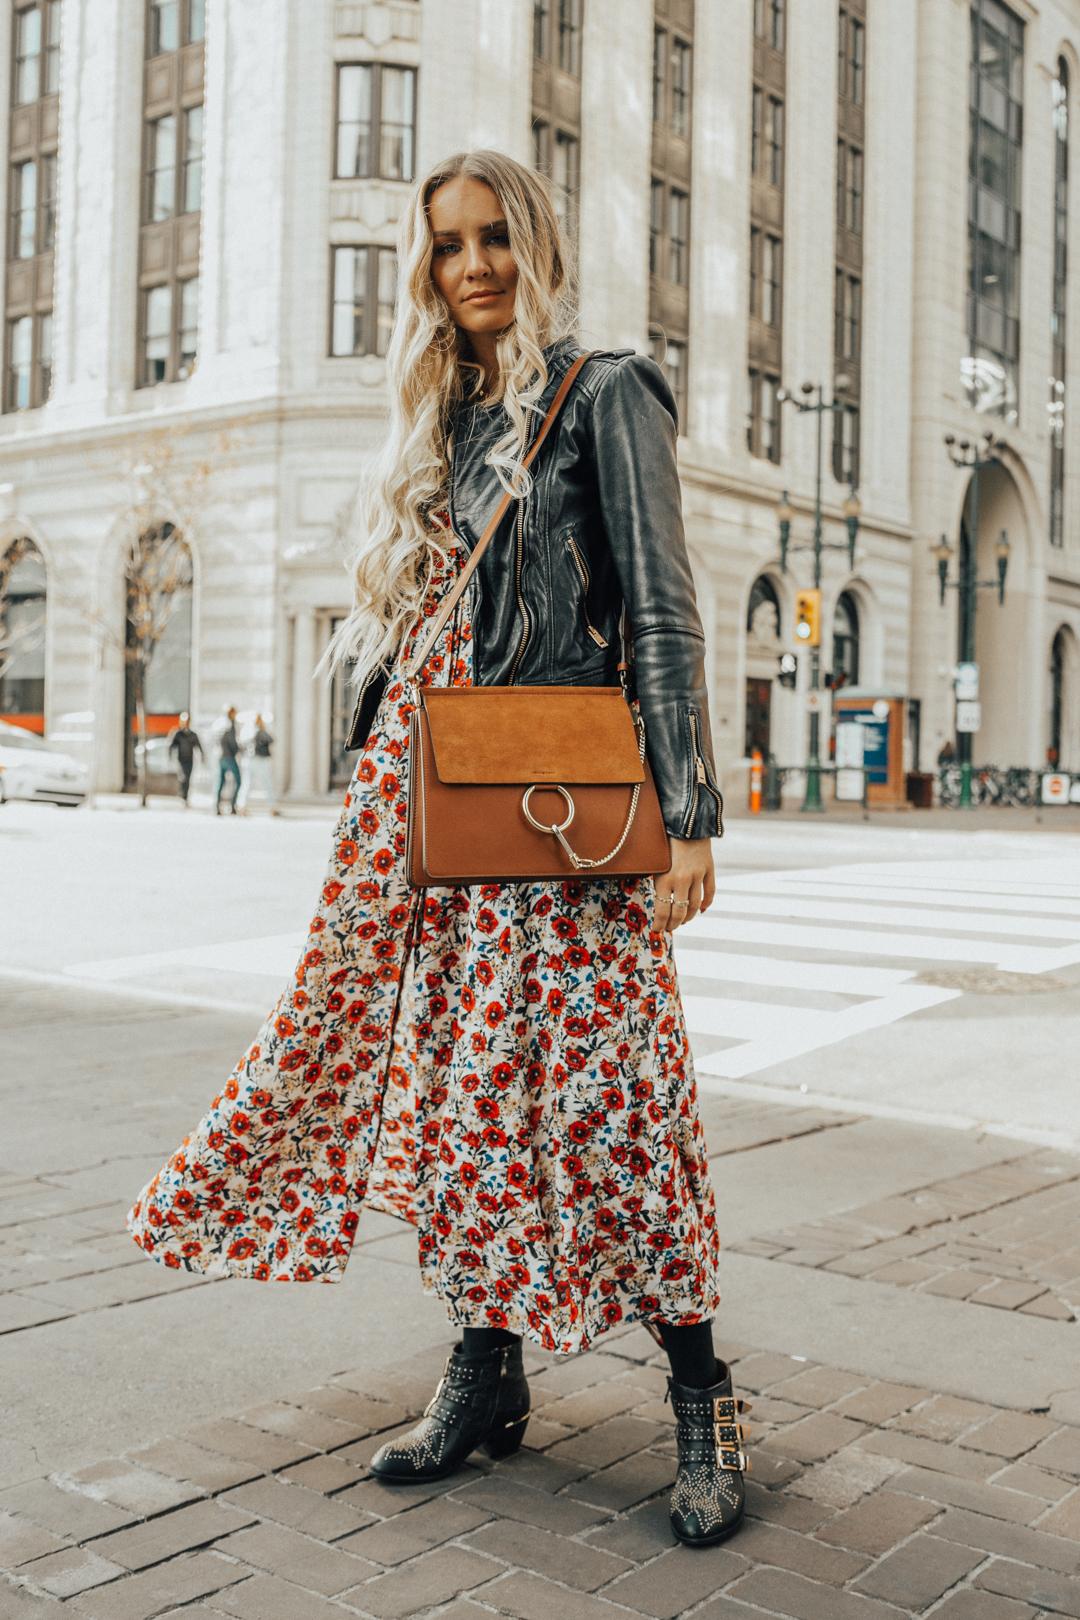 baac8a4a4d5 Fall Autumn Outfit Floral Maxi Dress Leather Jacket CHloe Boots Chloe Bag-18